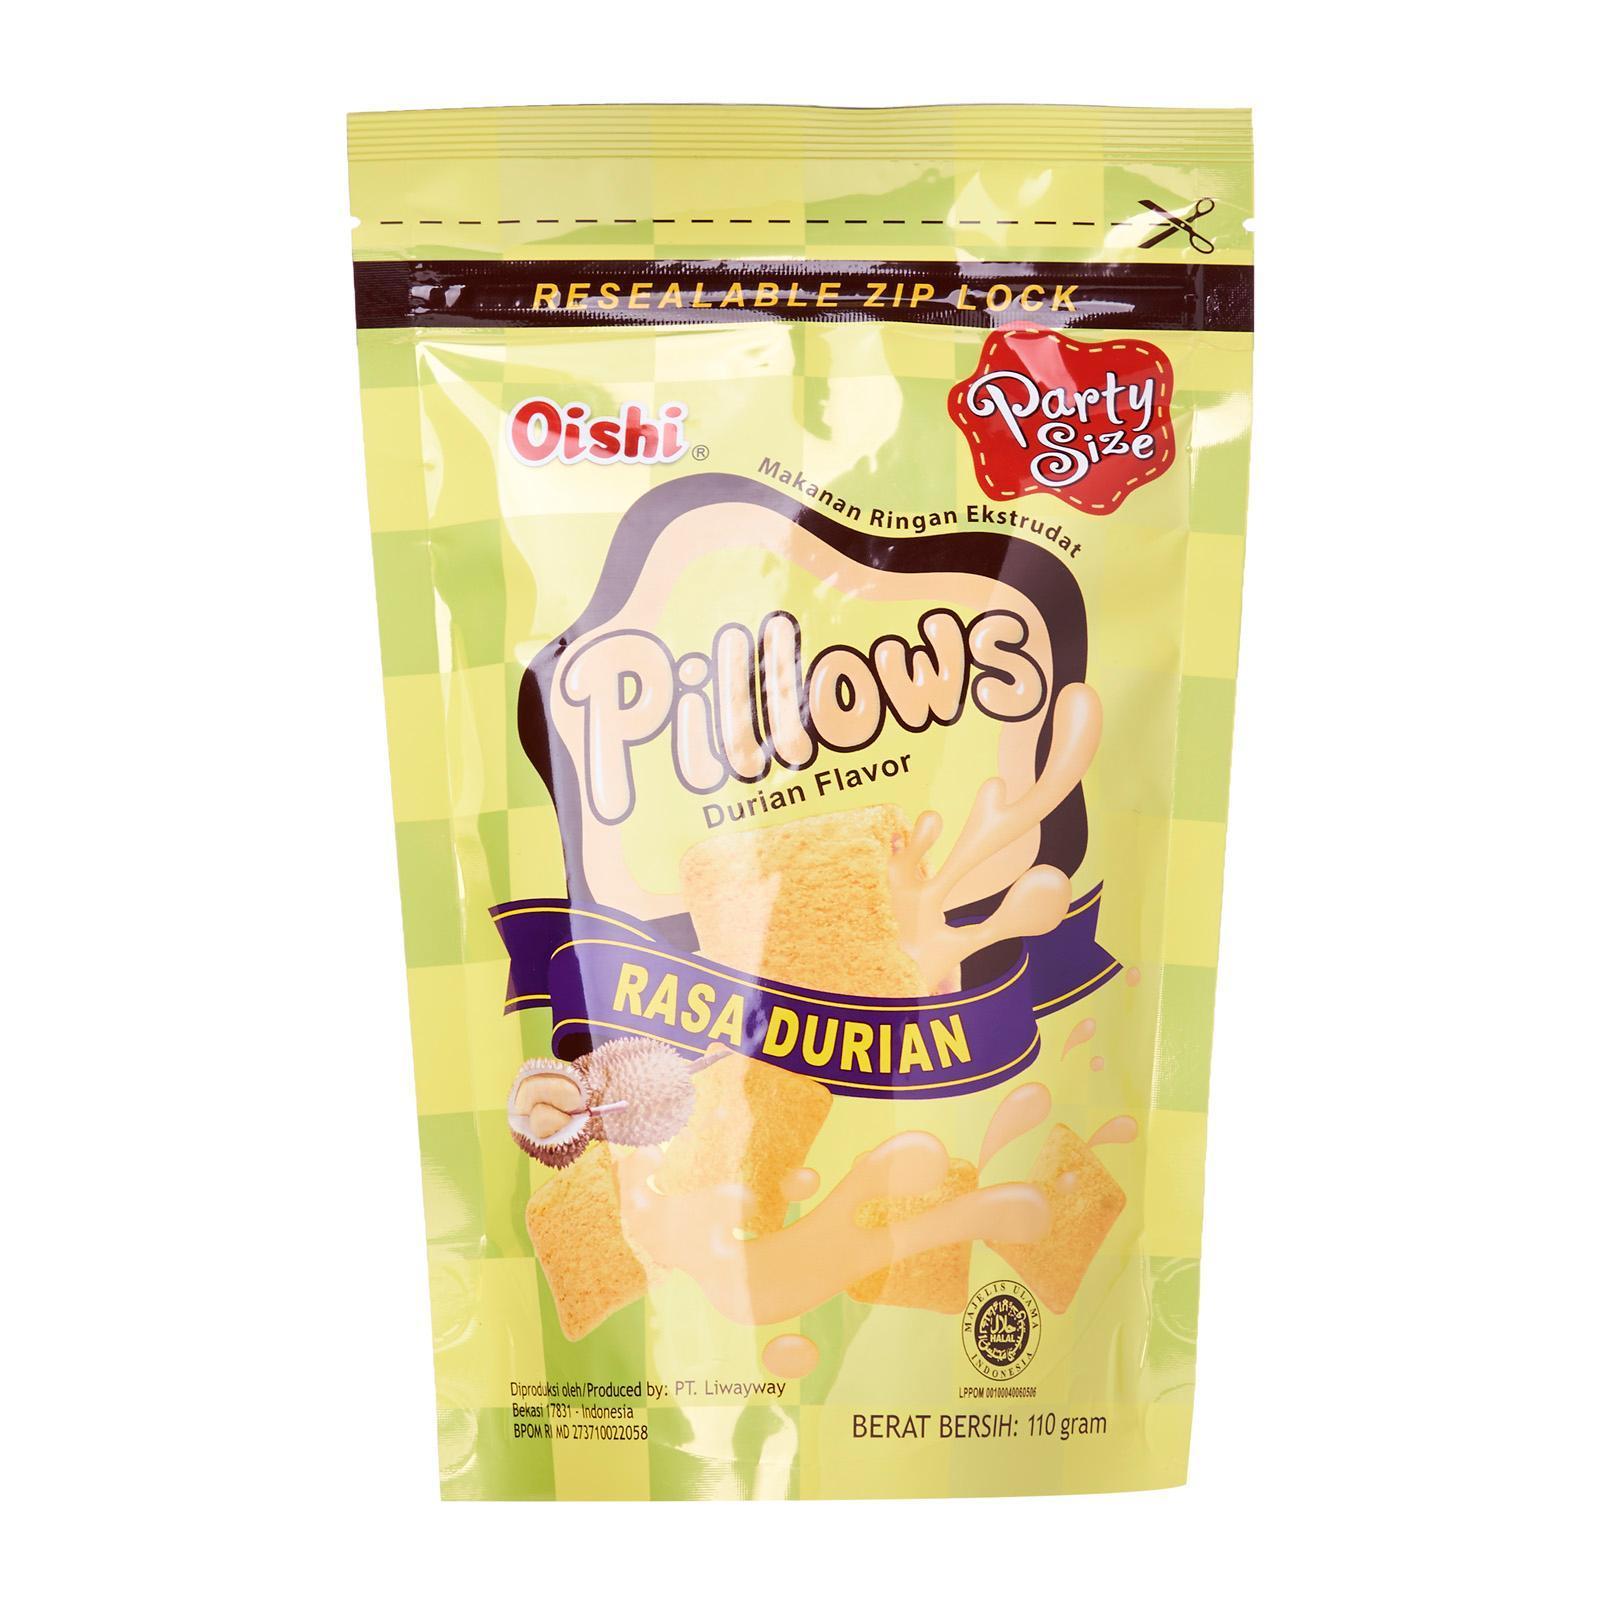 Oishi Oishi Pillow Durian